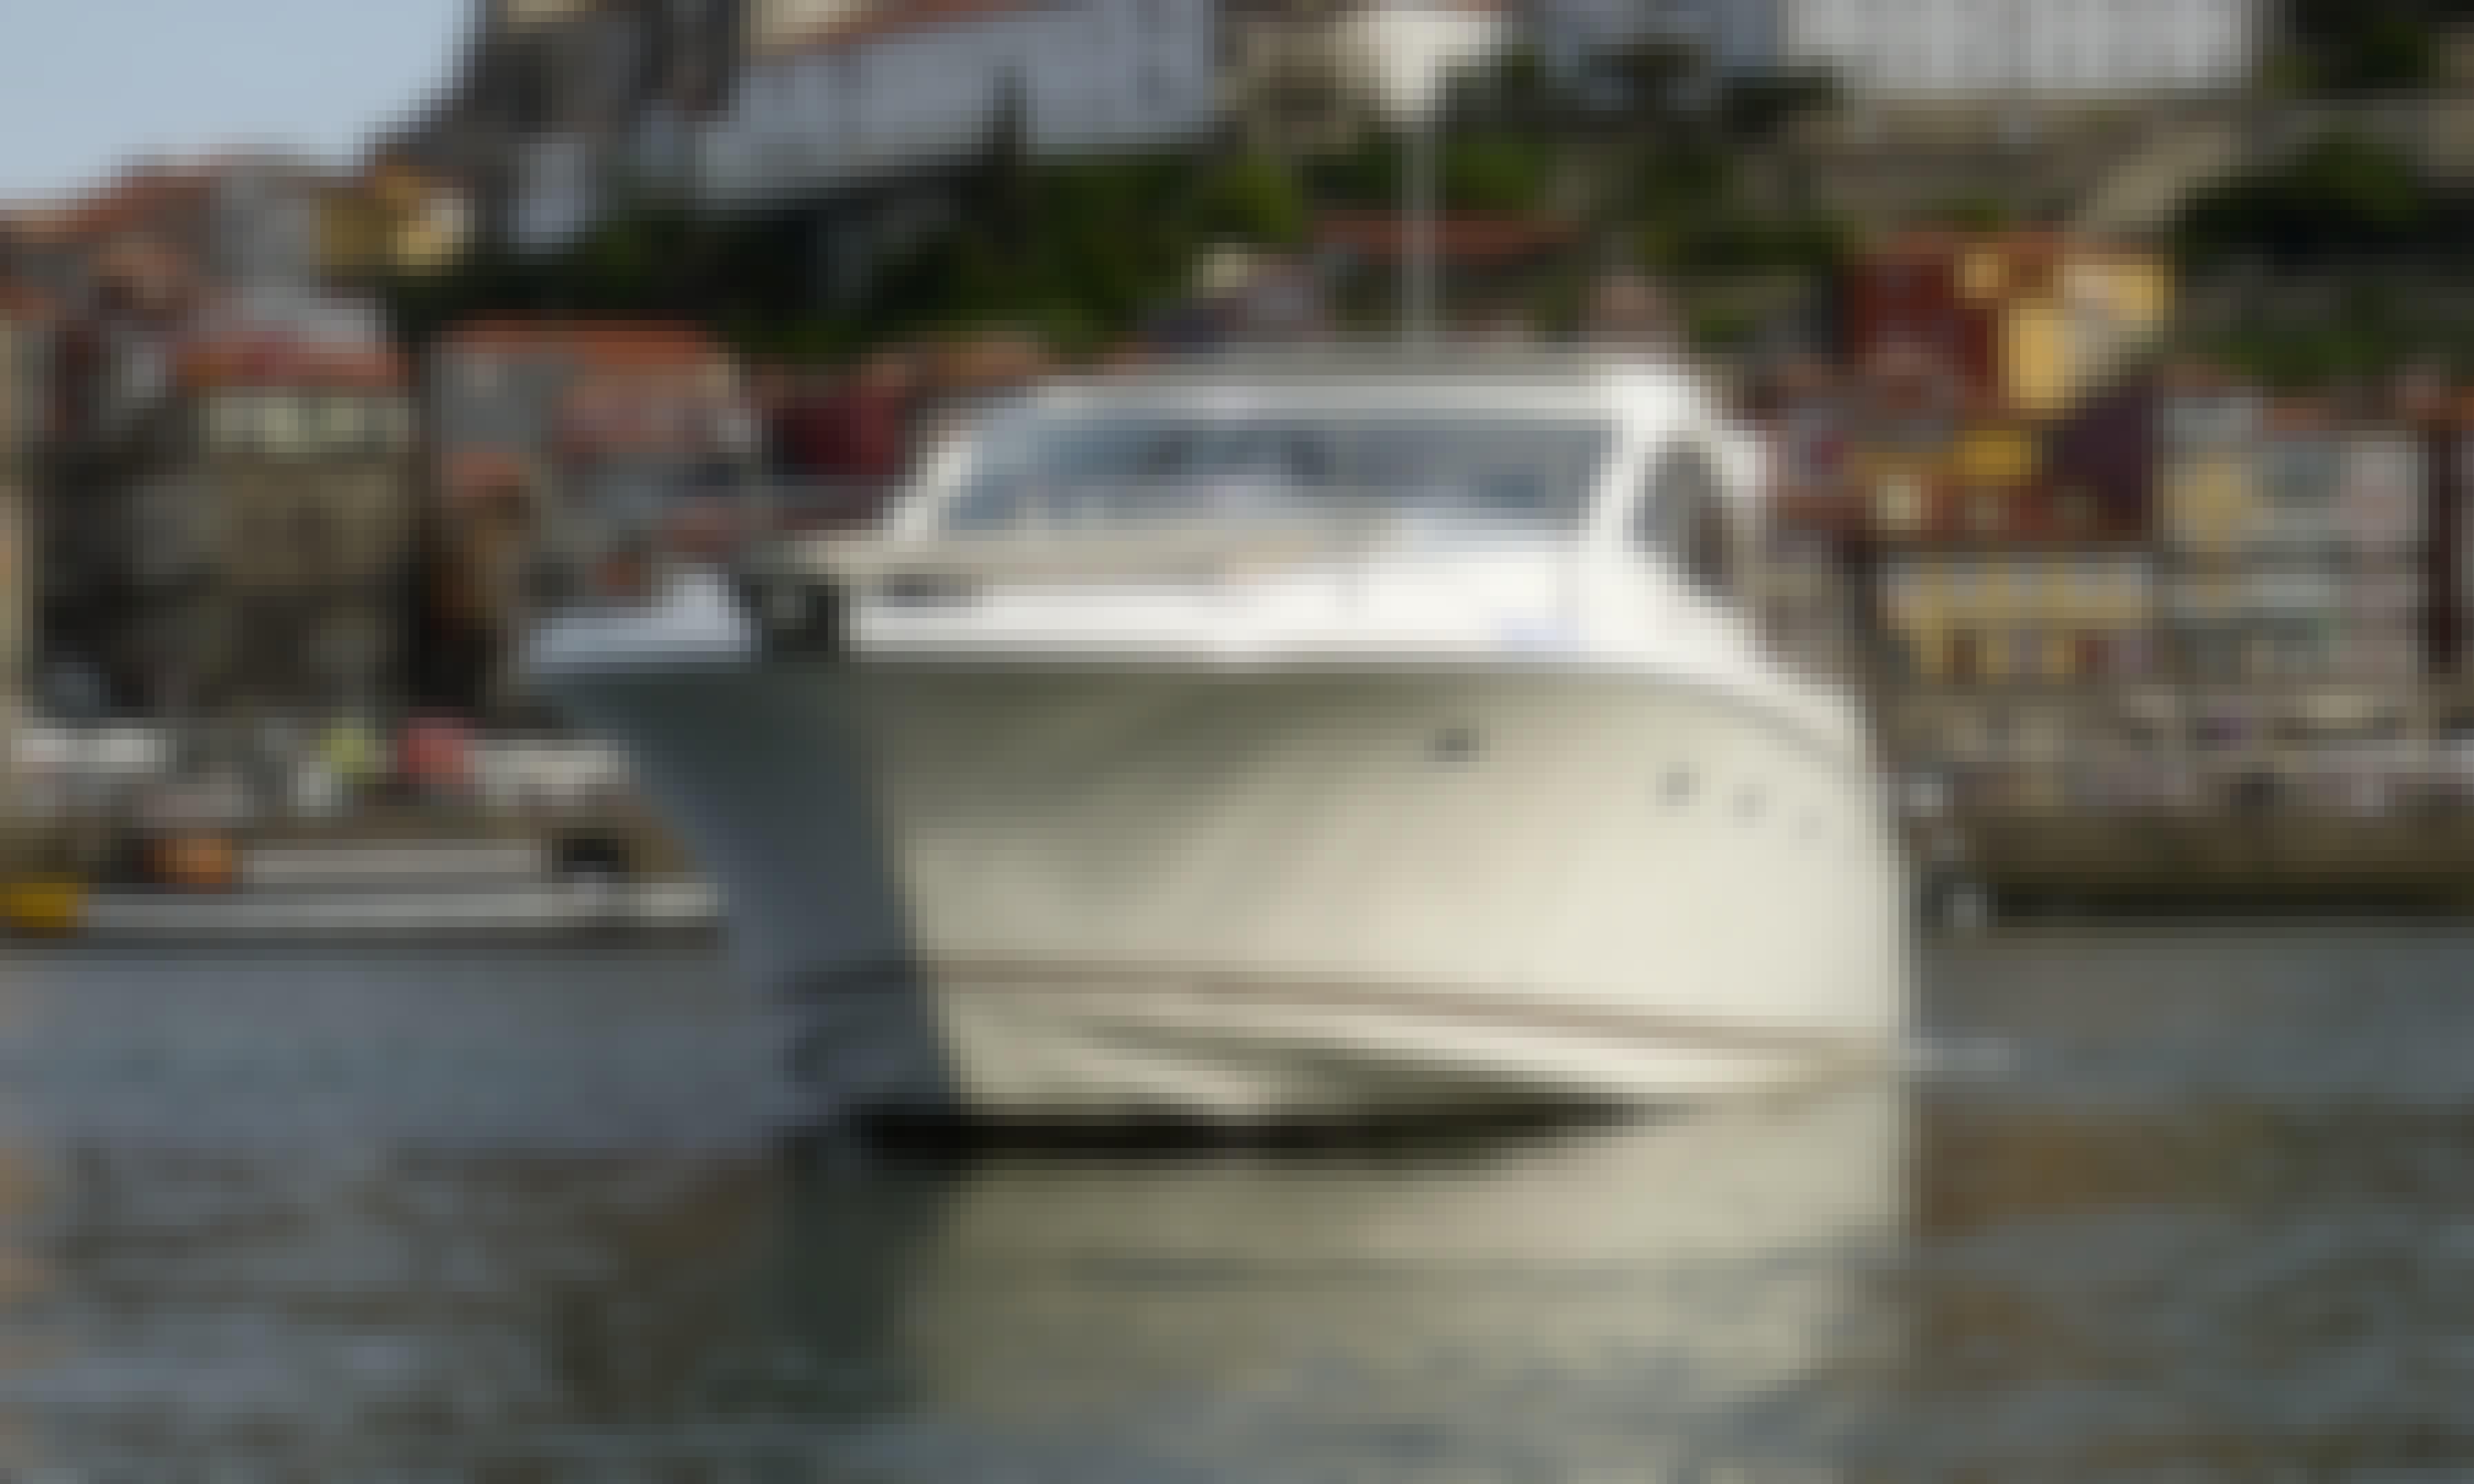 Prestige Jeanneau 42' S Charter on the Douro River, Portugal